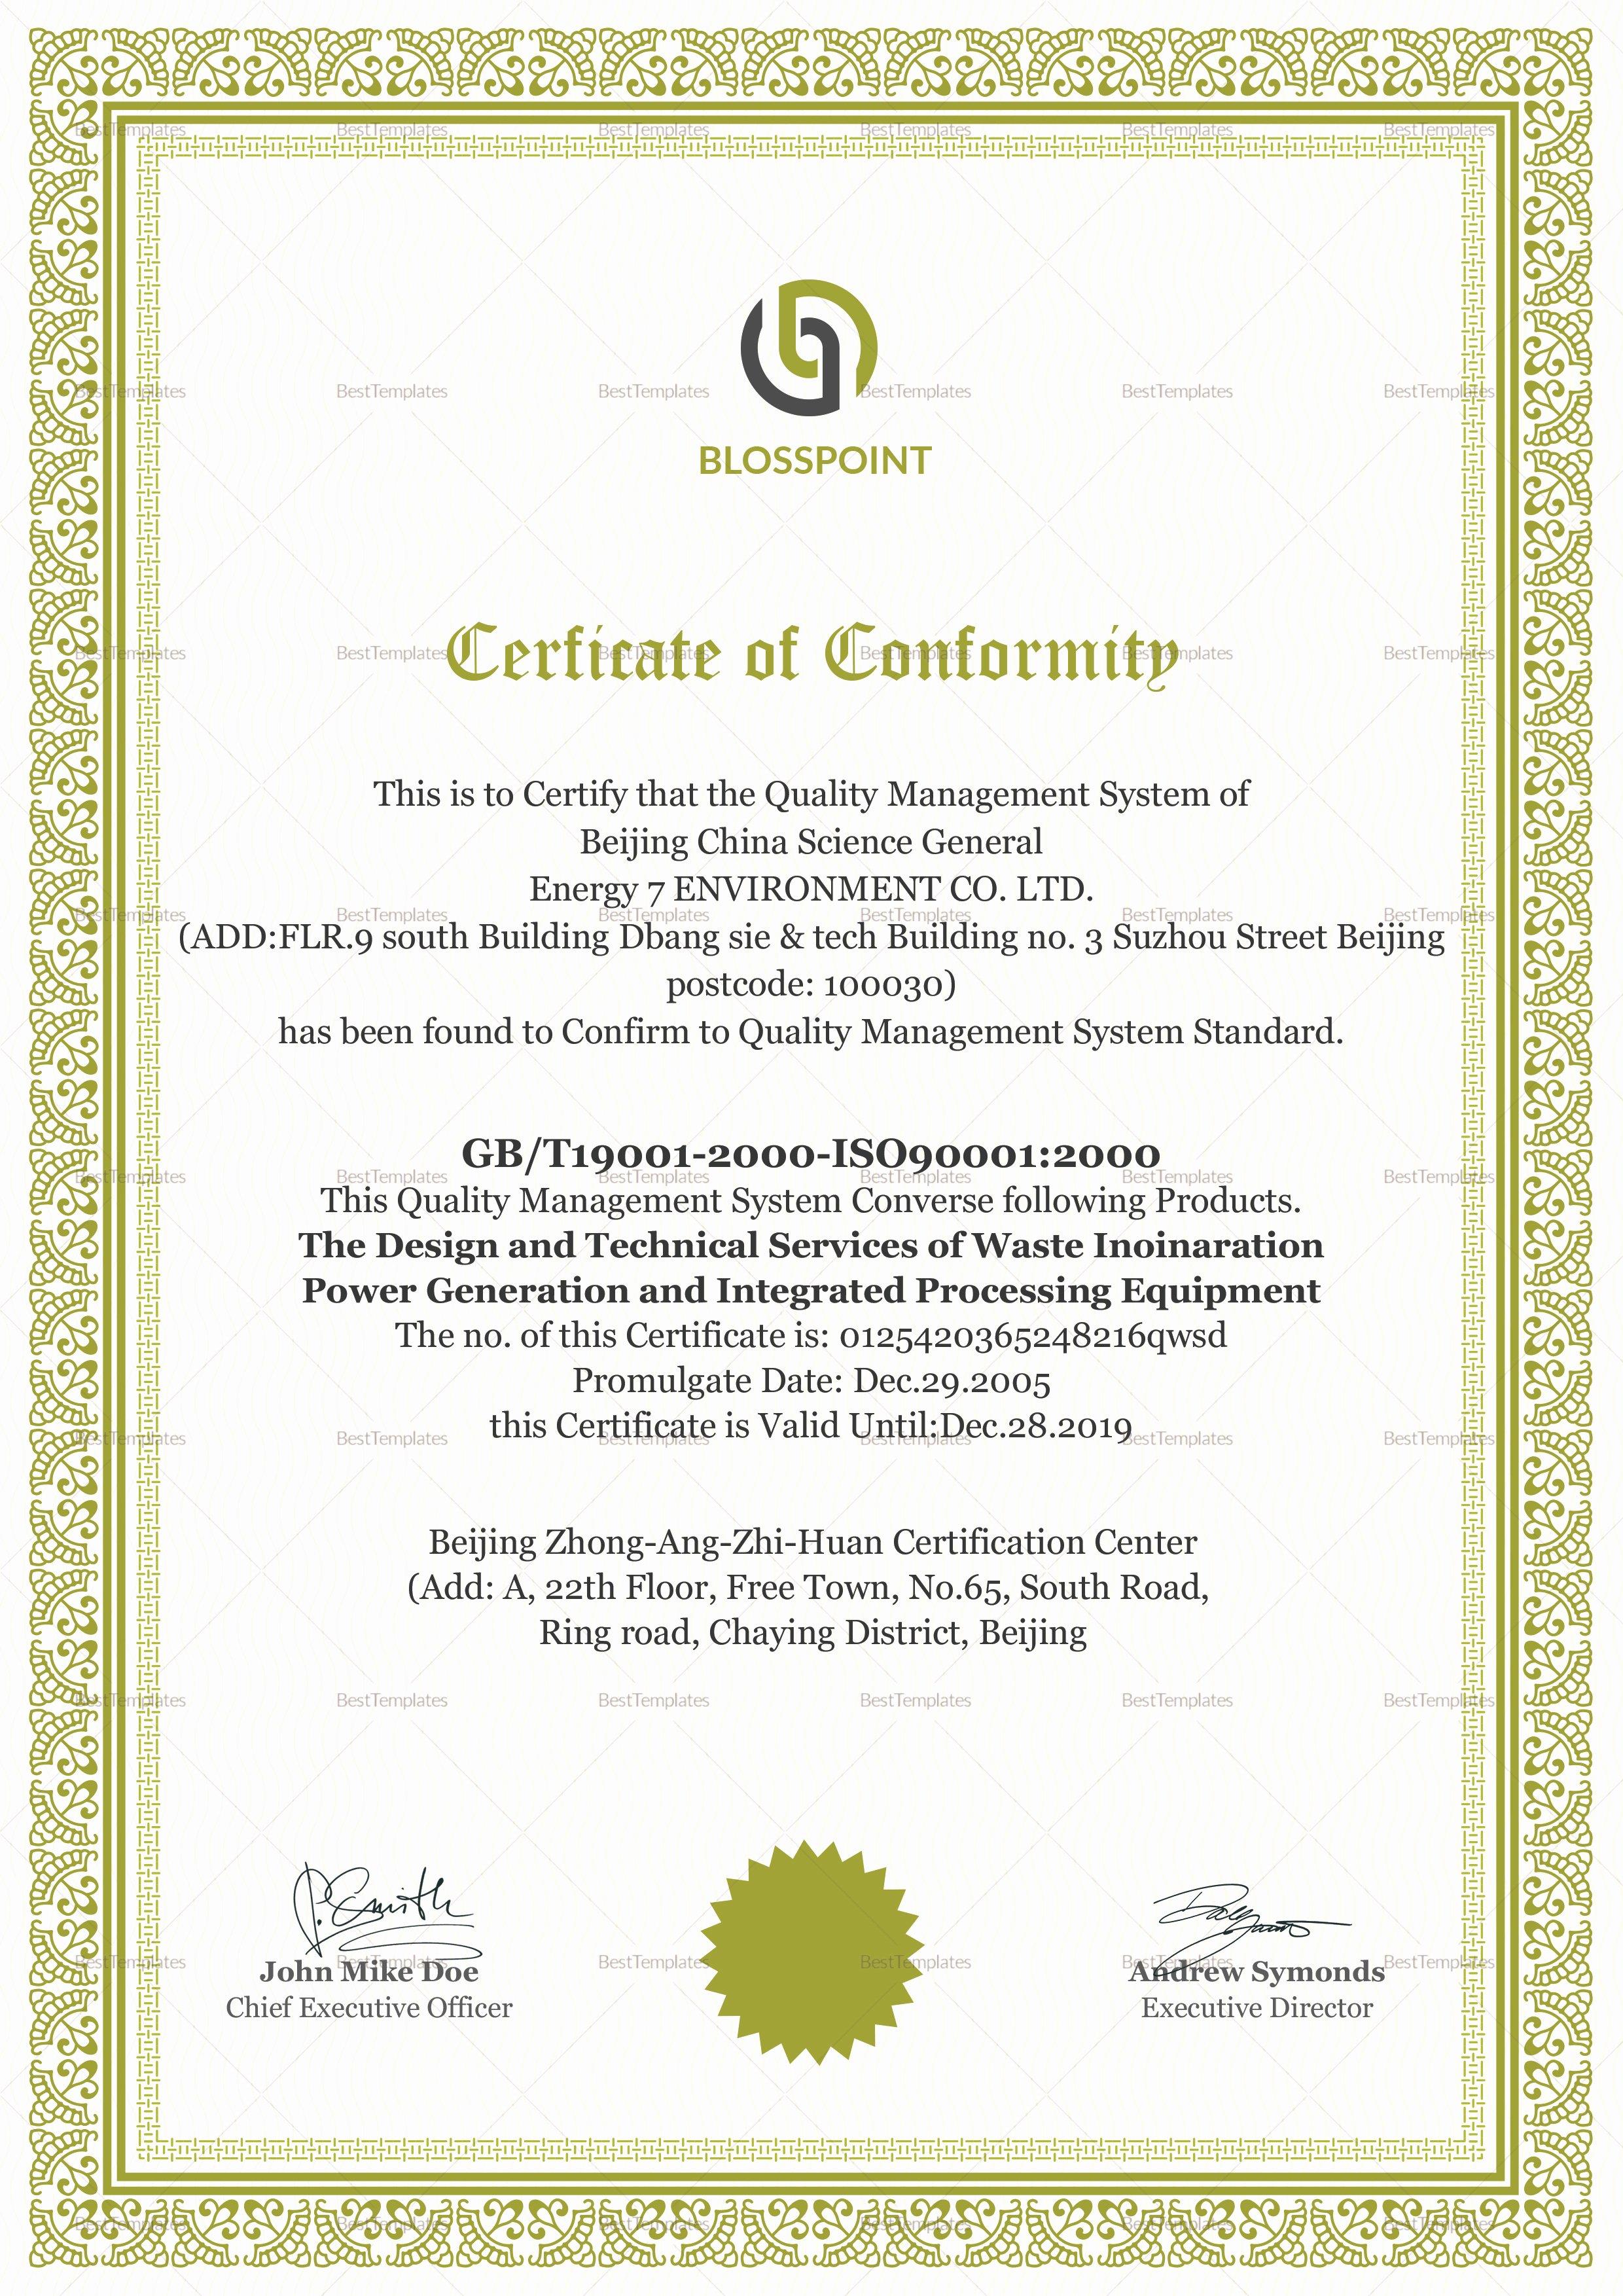 Certificate Of Conformity Template Beautiful Simple Conformity Certificate Design Template In Psd Word